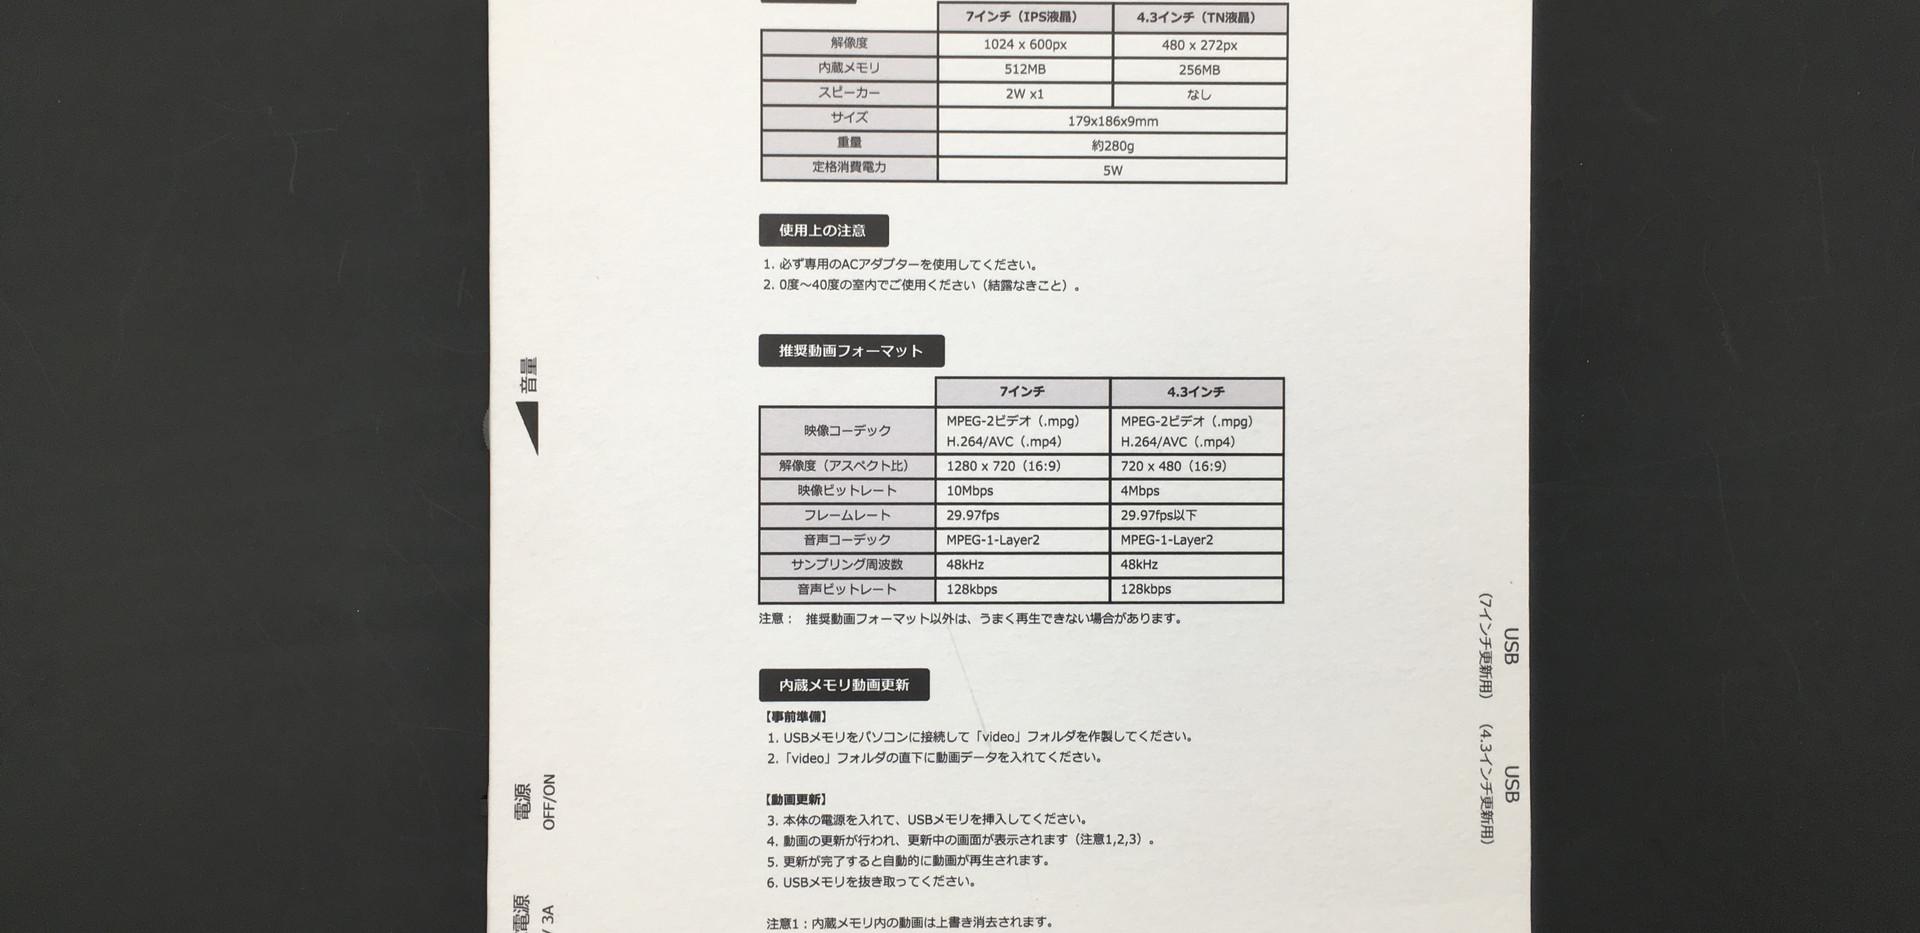 IMG_4402.JPG